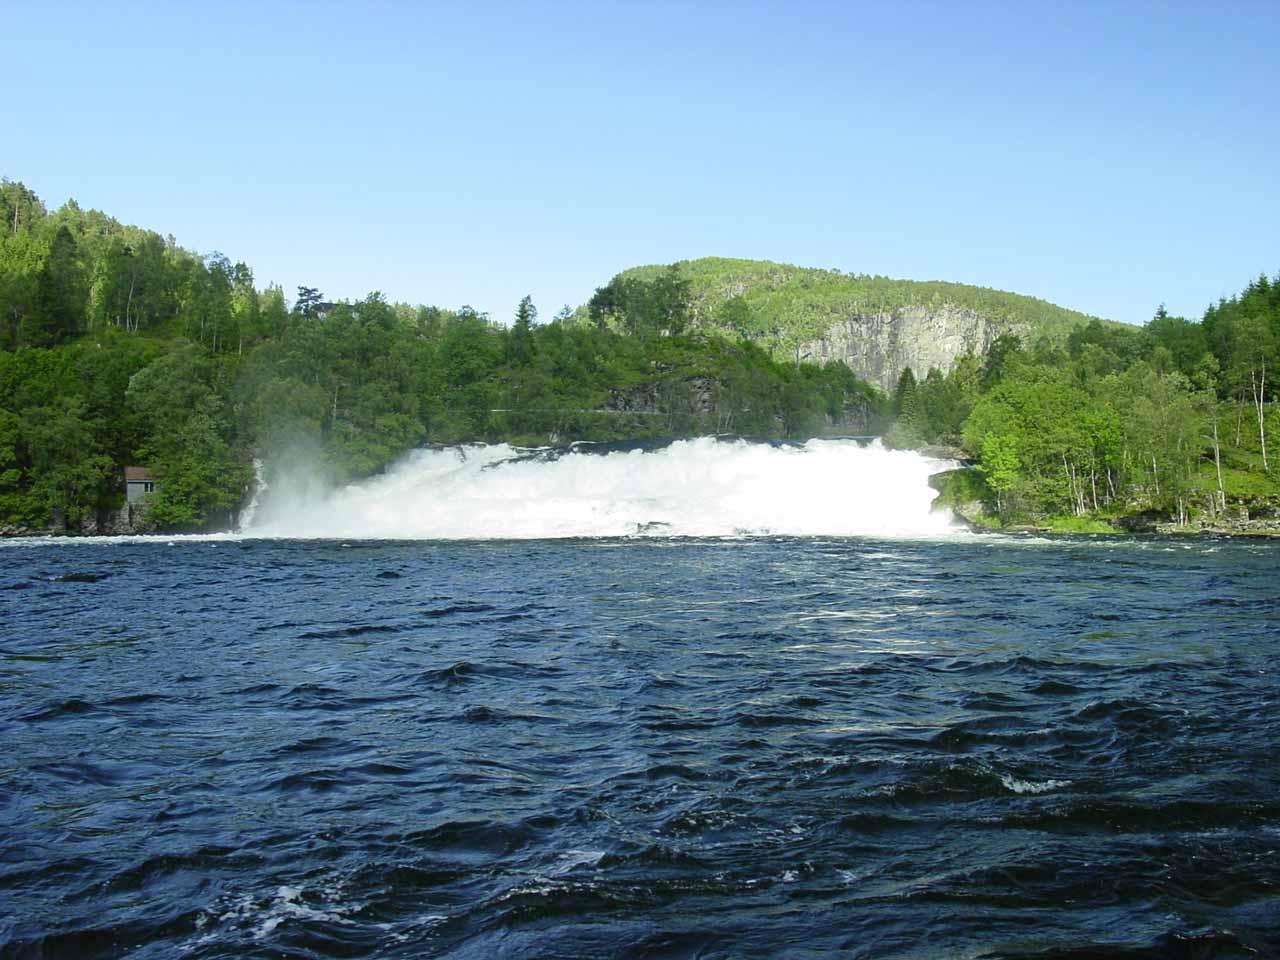 Contextual view of the Osenfoss or Osfoss waterfall